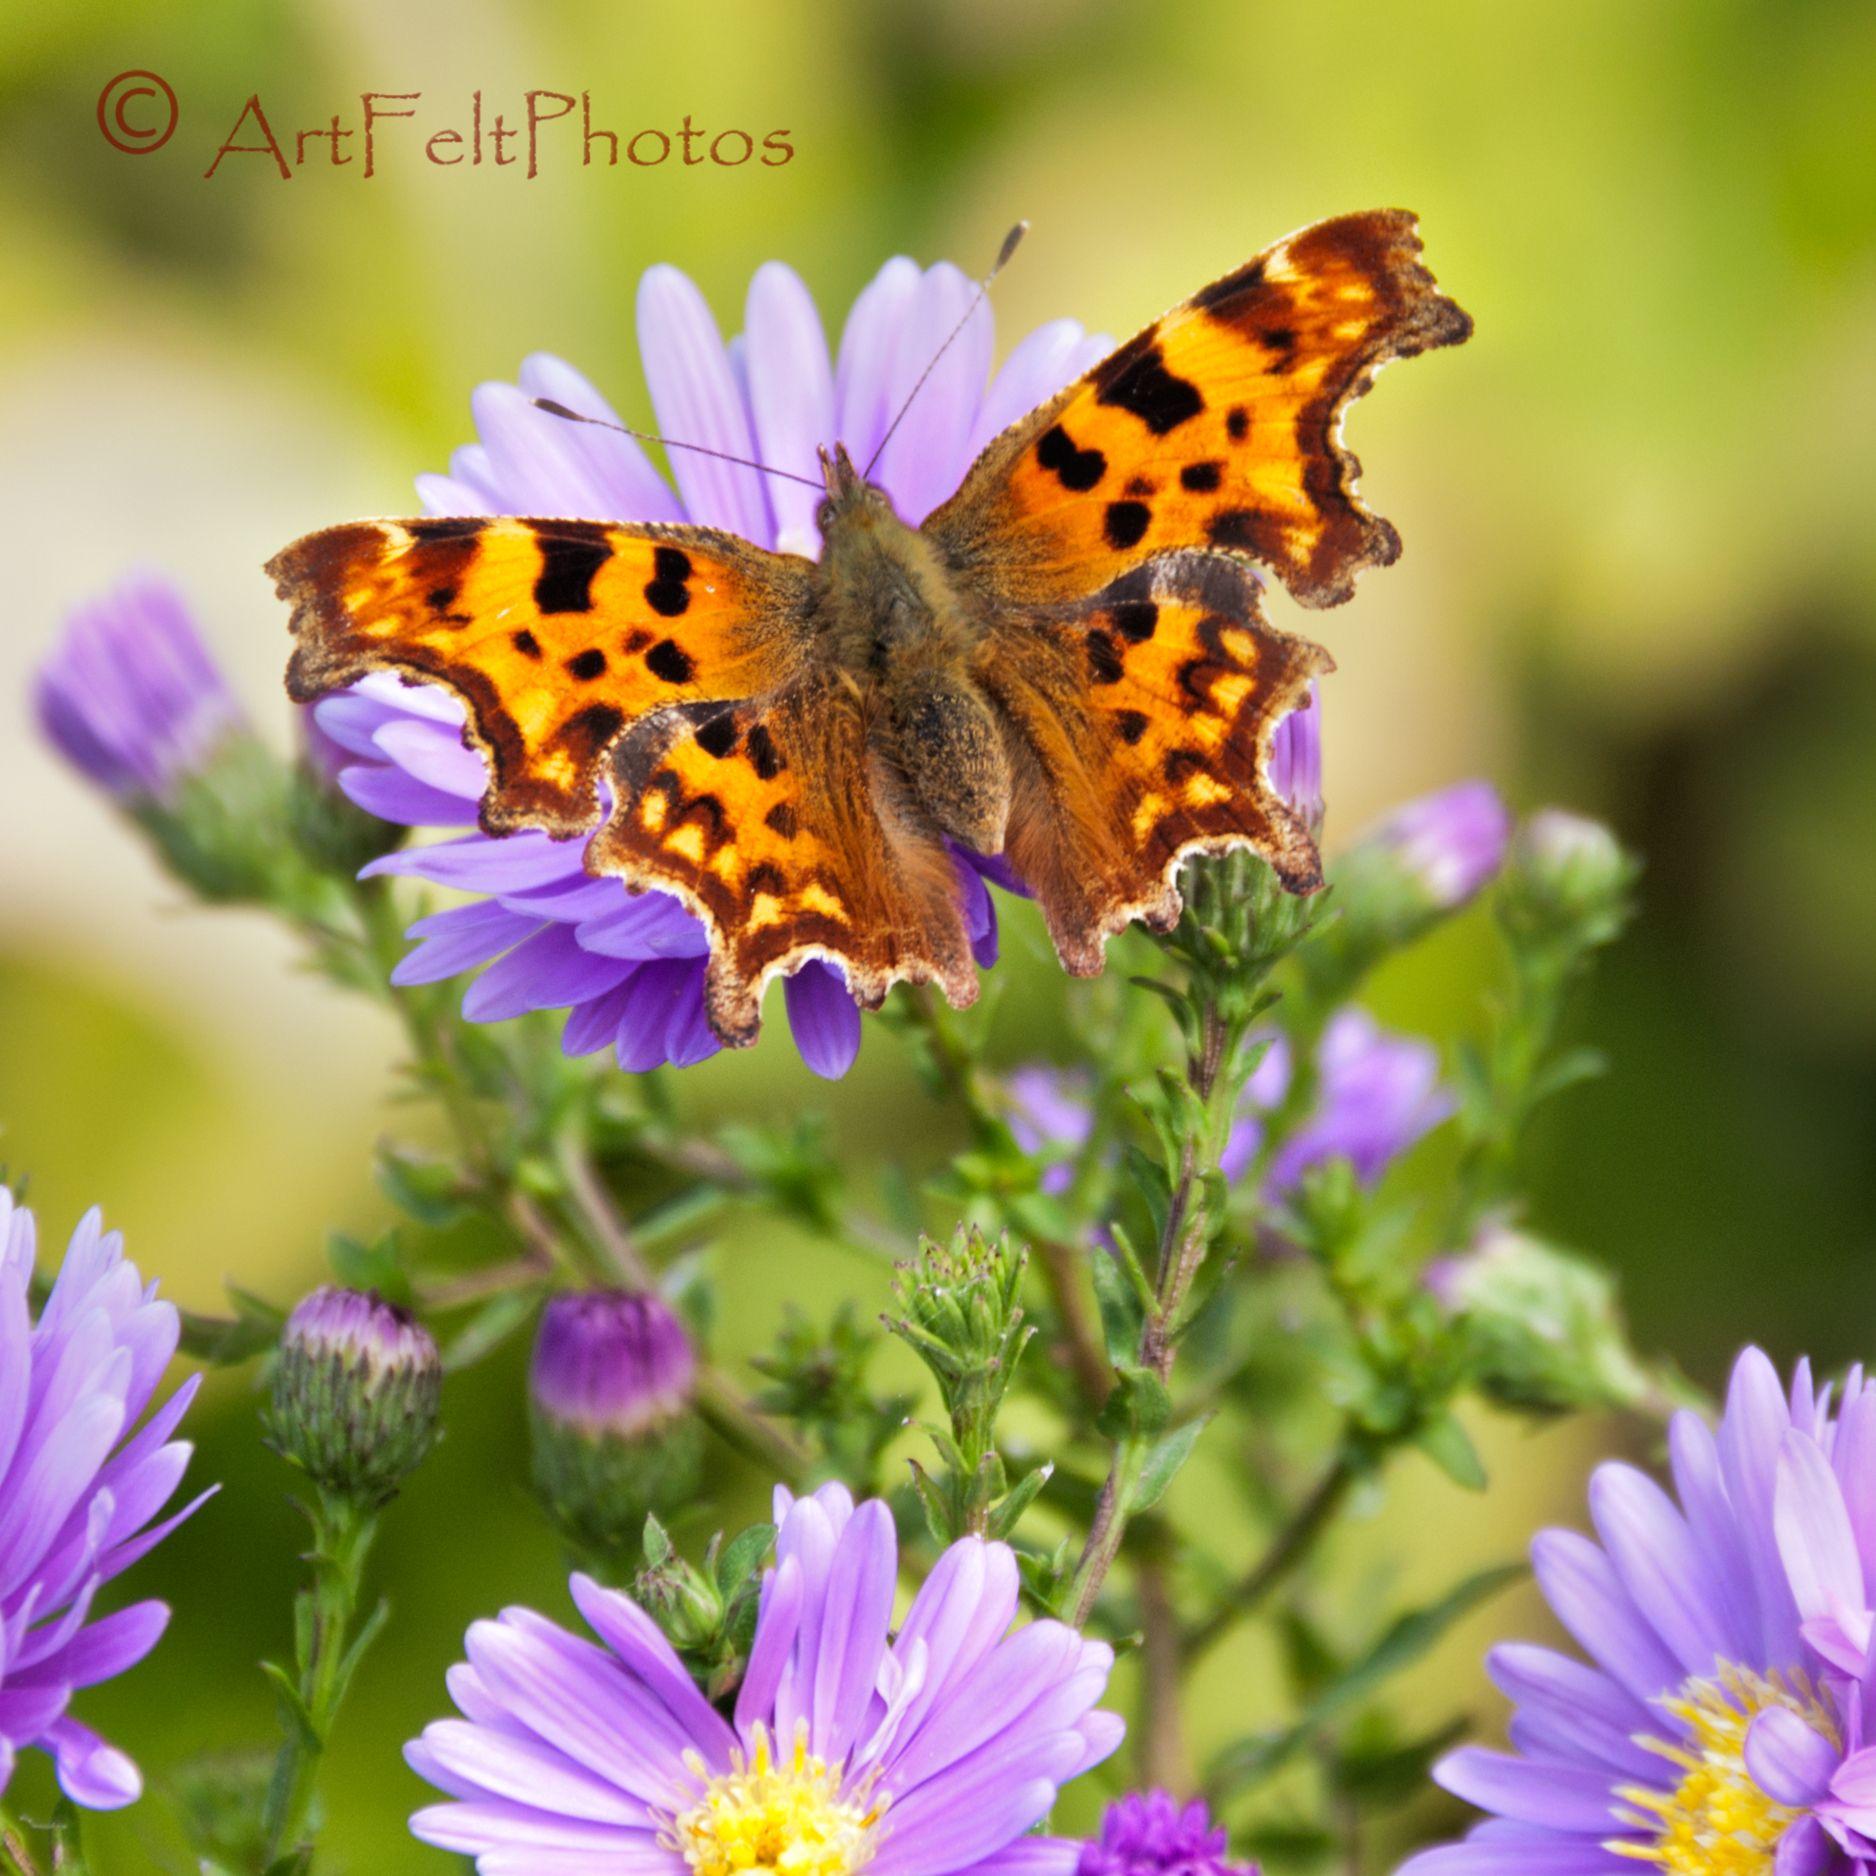 Comma butterfly on Michaelmas daisy